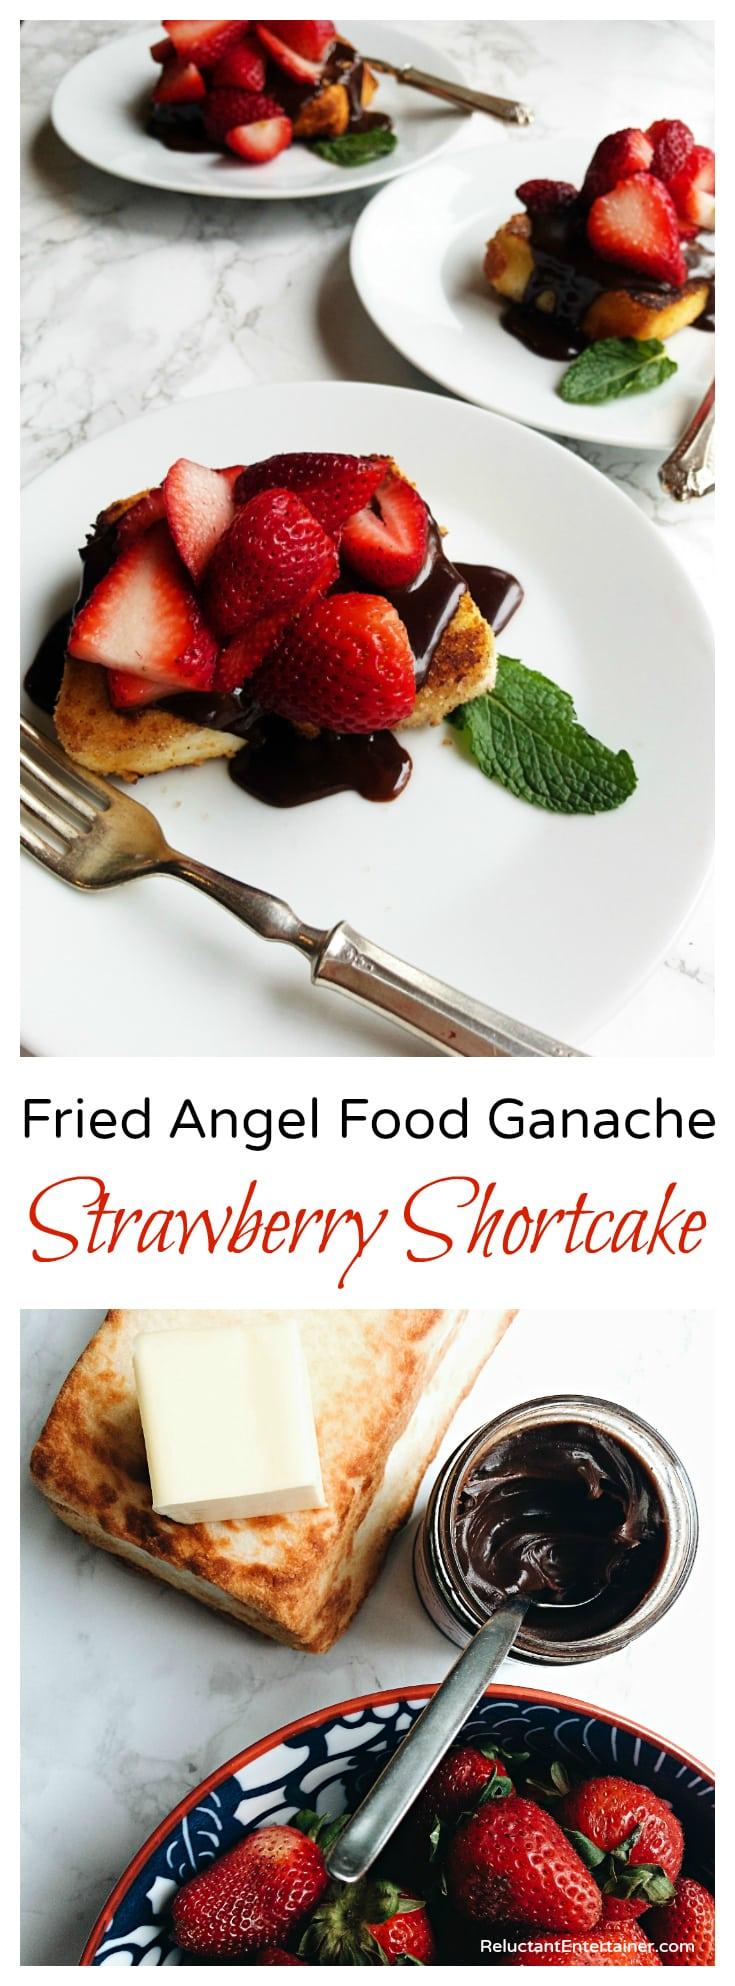 Fried Angel Food Ganache Strawberry Shortcake